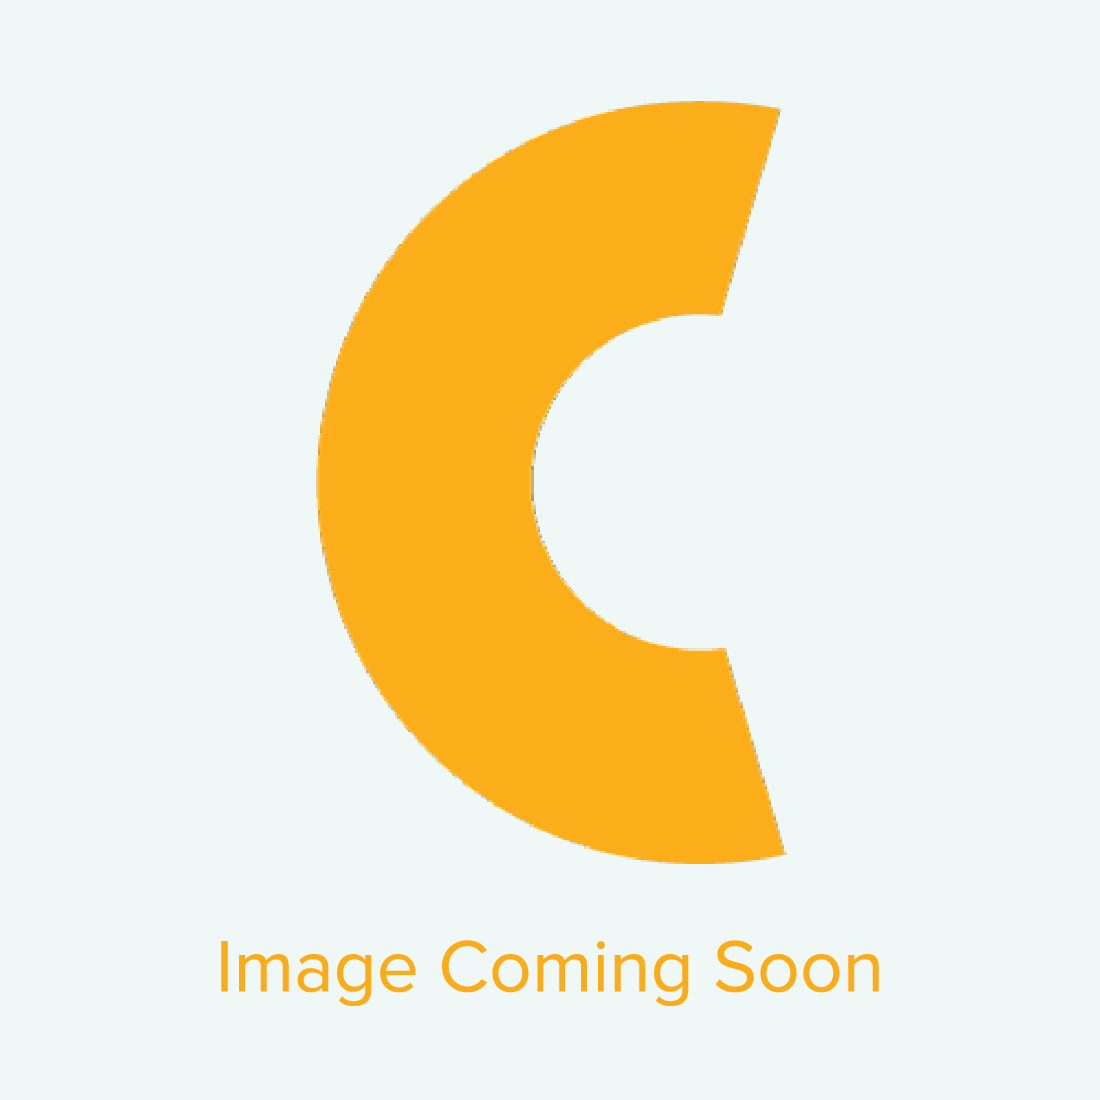 "Sublimation Photo Slate Rock Plaque - Med. Rectangle - 5.9"" x 7.9"" (28/case)"